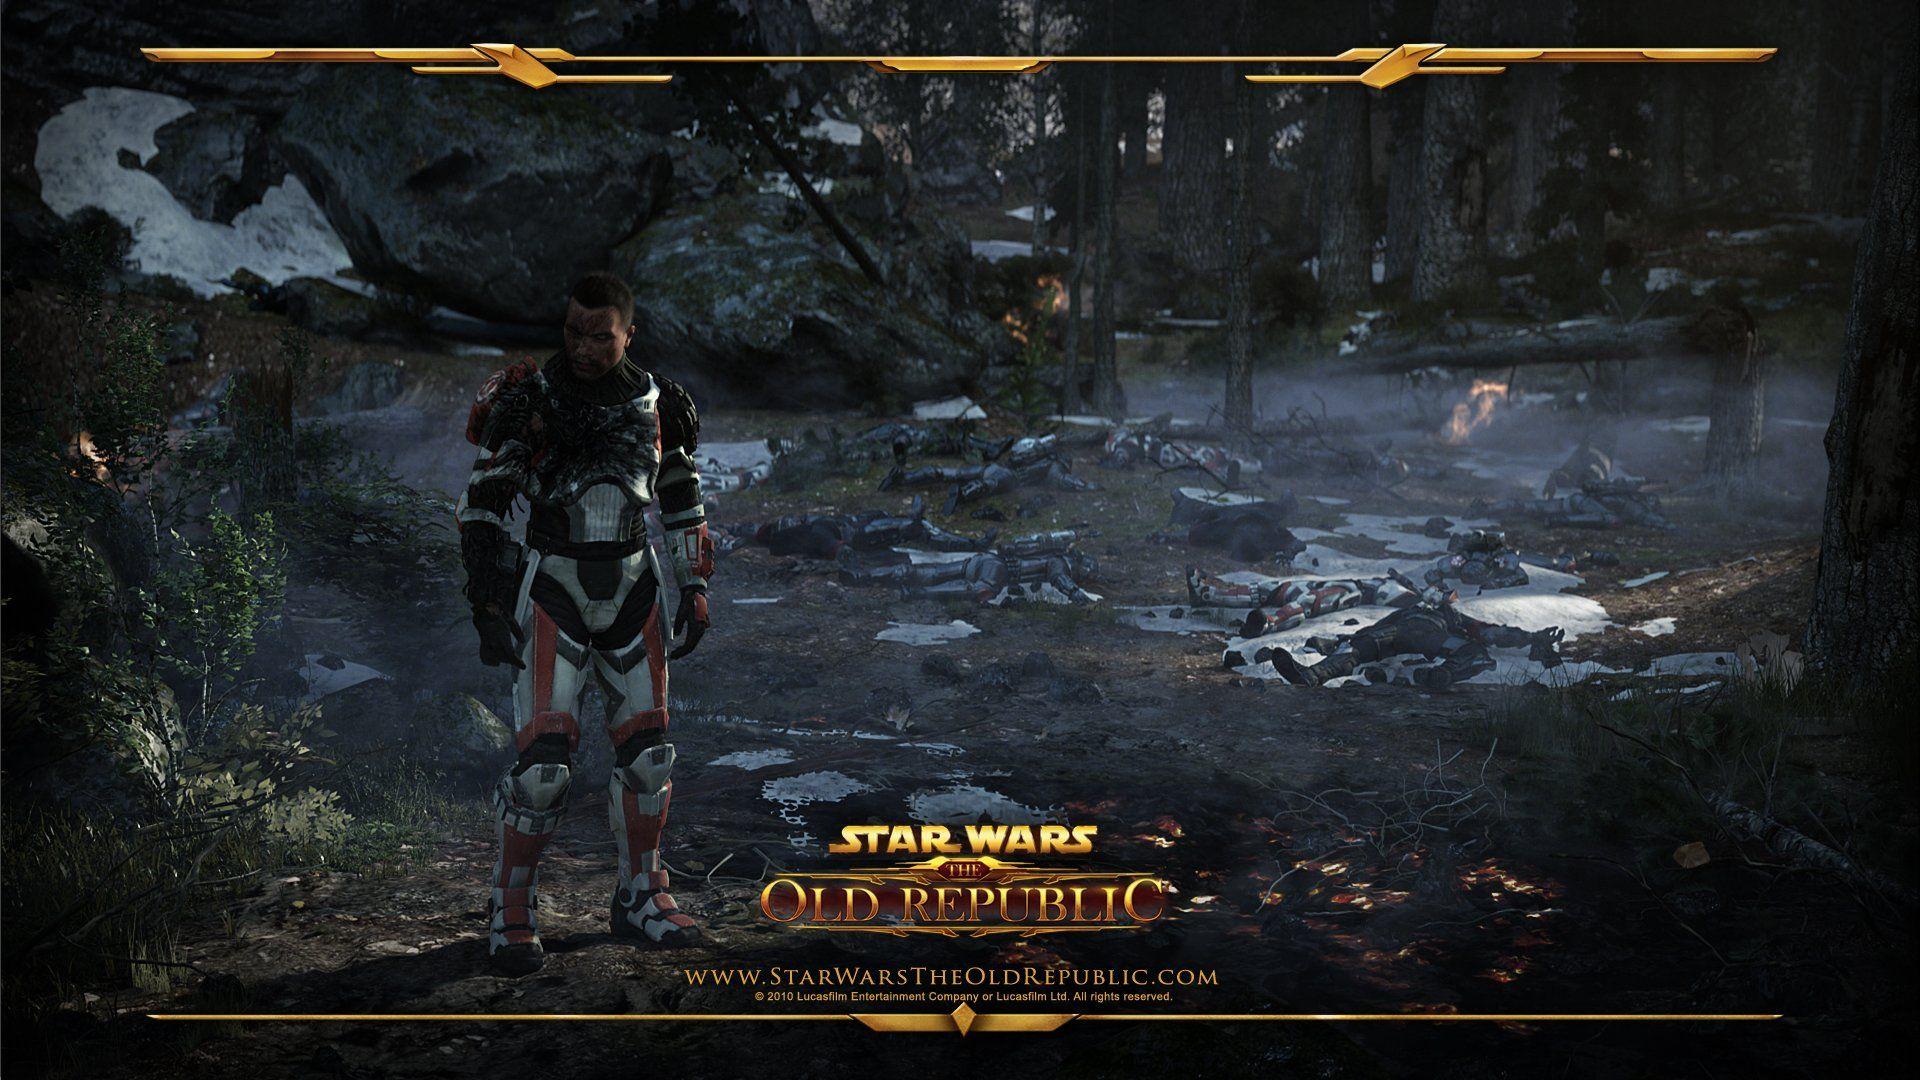 Star Wars The Old Republic Wallpaper Walldevil Best Free Hd